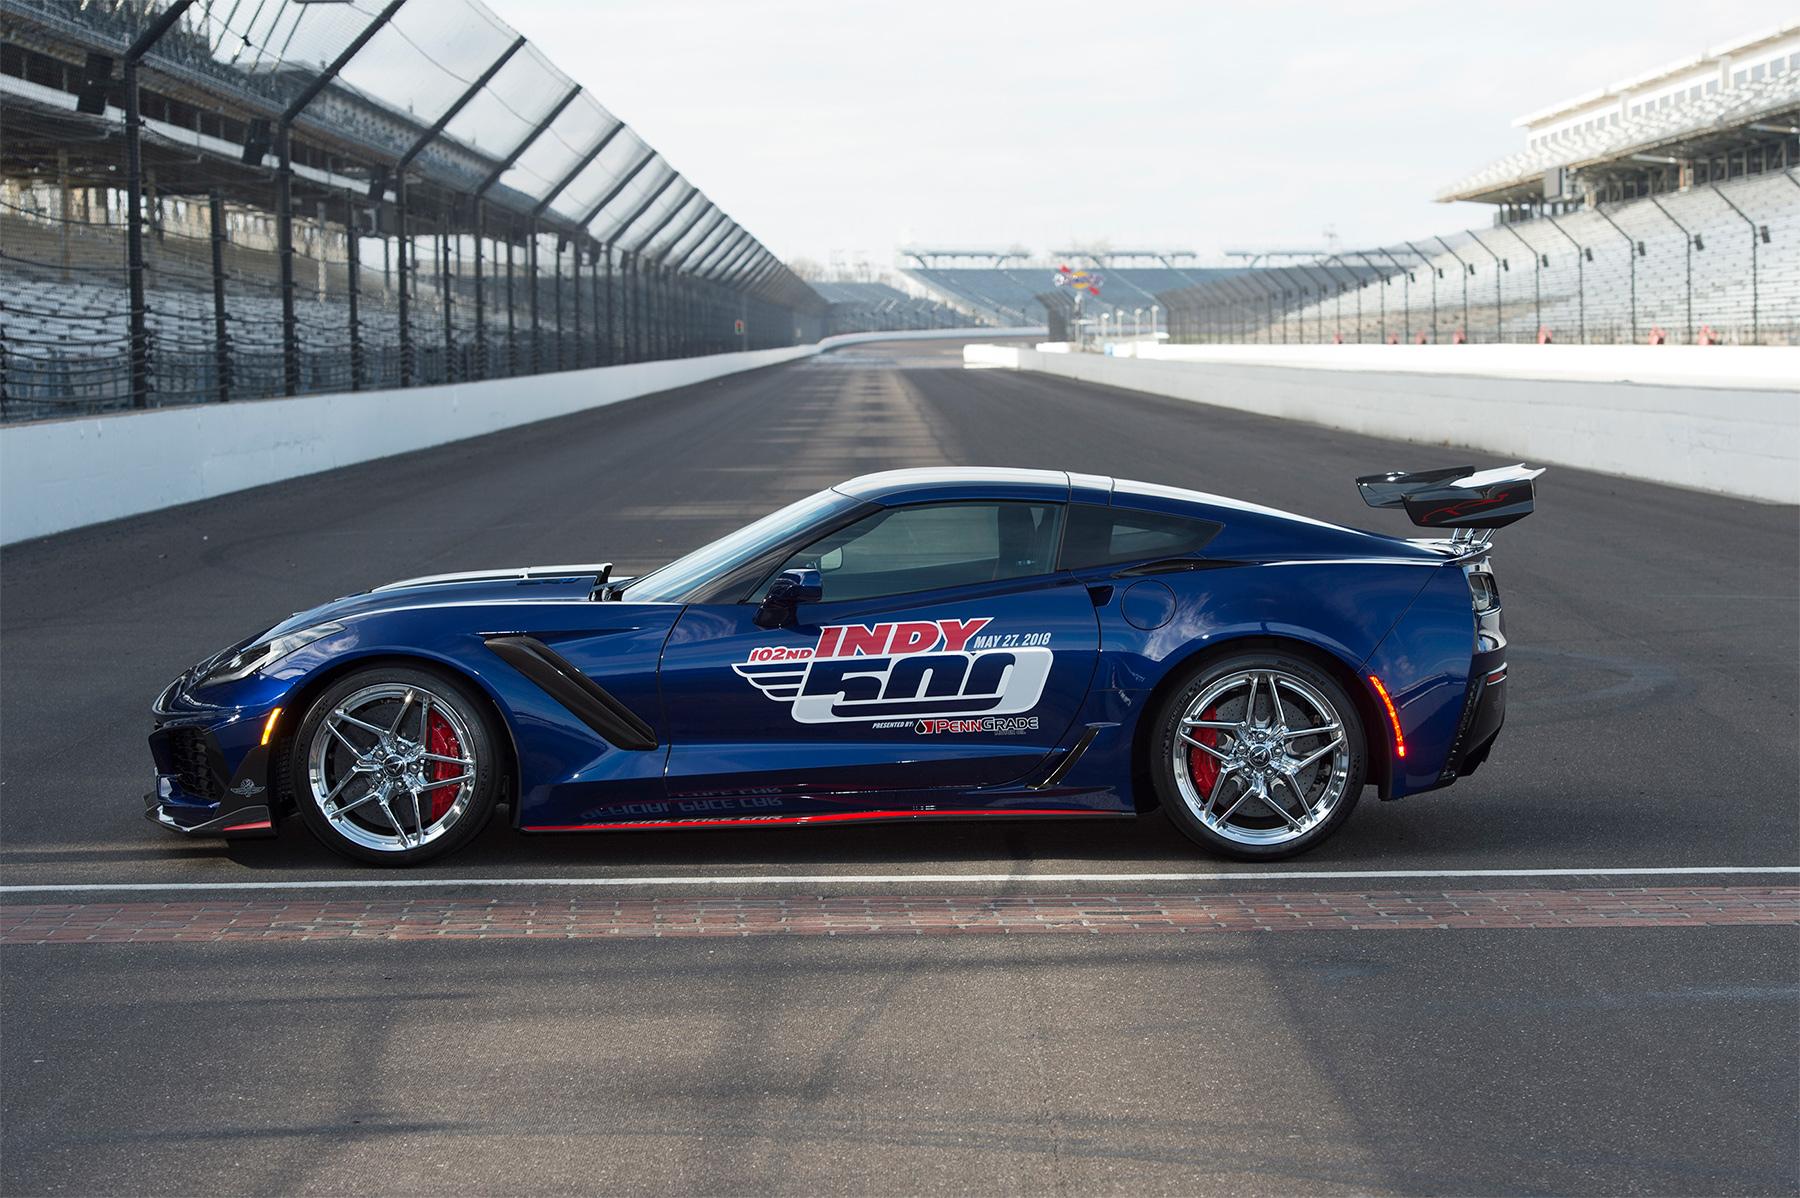 TrackWorthy - 2019 Chevrolet Corvette ZR1 Indianapolis 500 Pace Car (3)